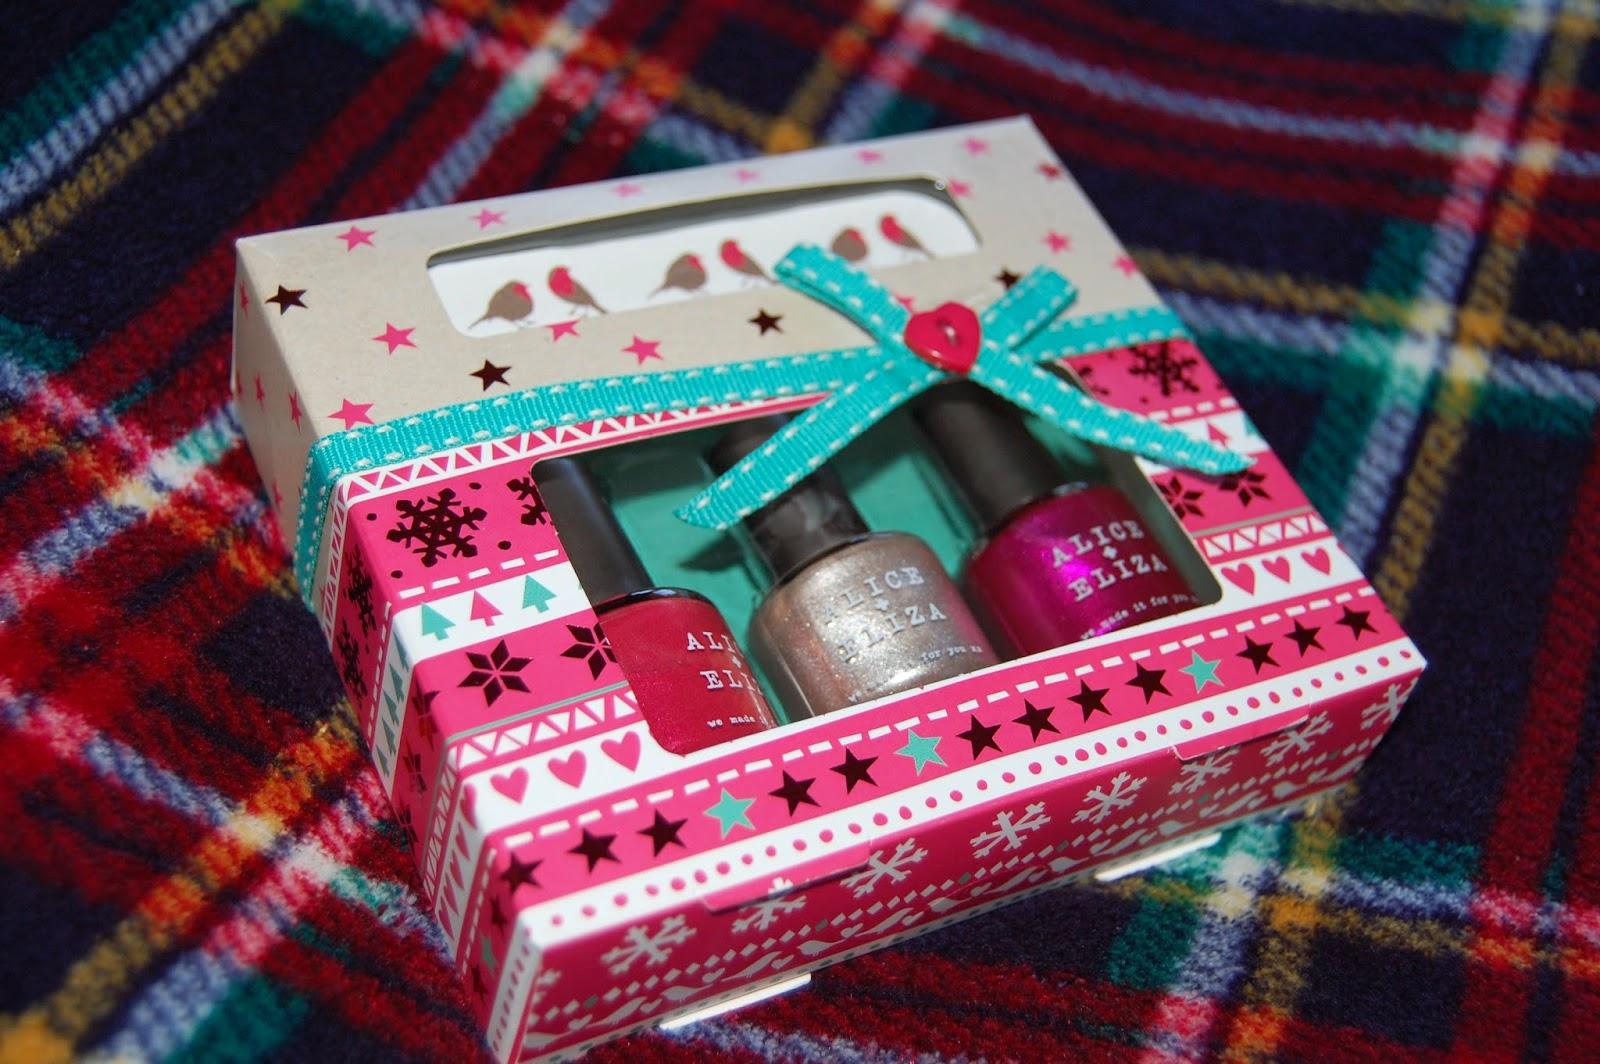 Fancy Nail Polish Christmas Gift Sets Composition - Nail Art Ideas ...